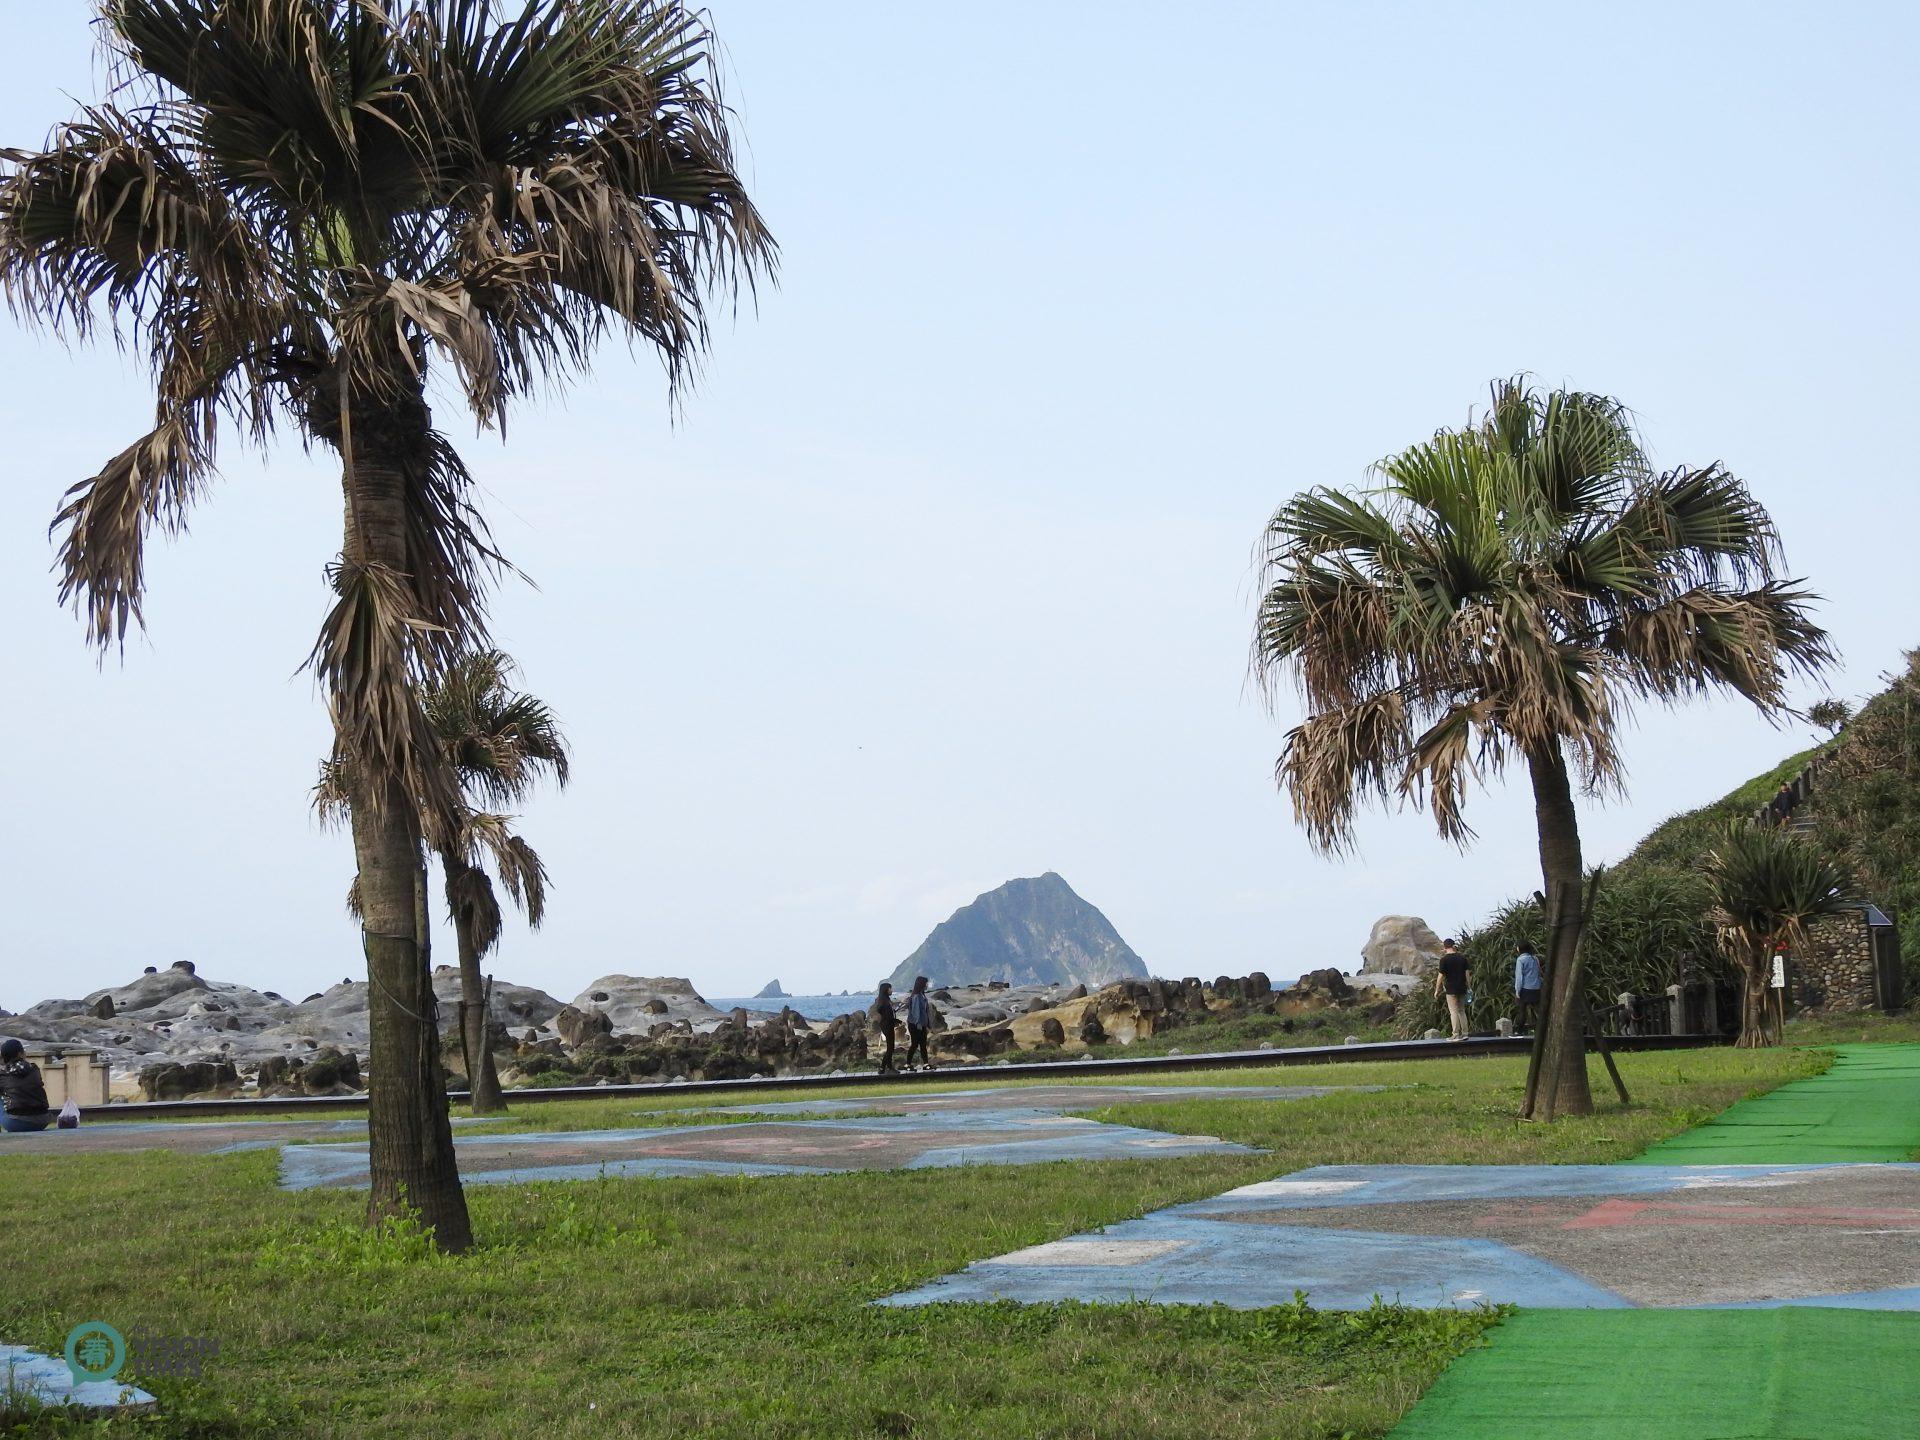 The Peace Island Coastal Park is also a good place to have picnics. (Image: Julia Fu / Vision Times)